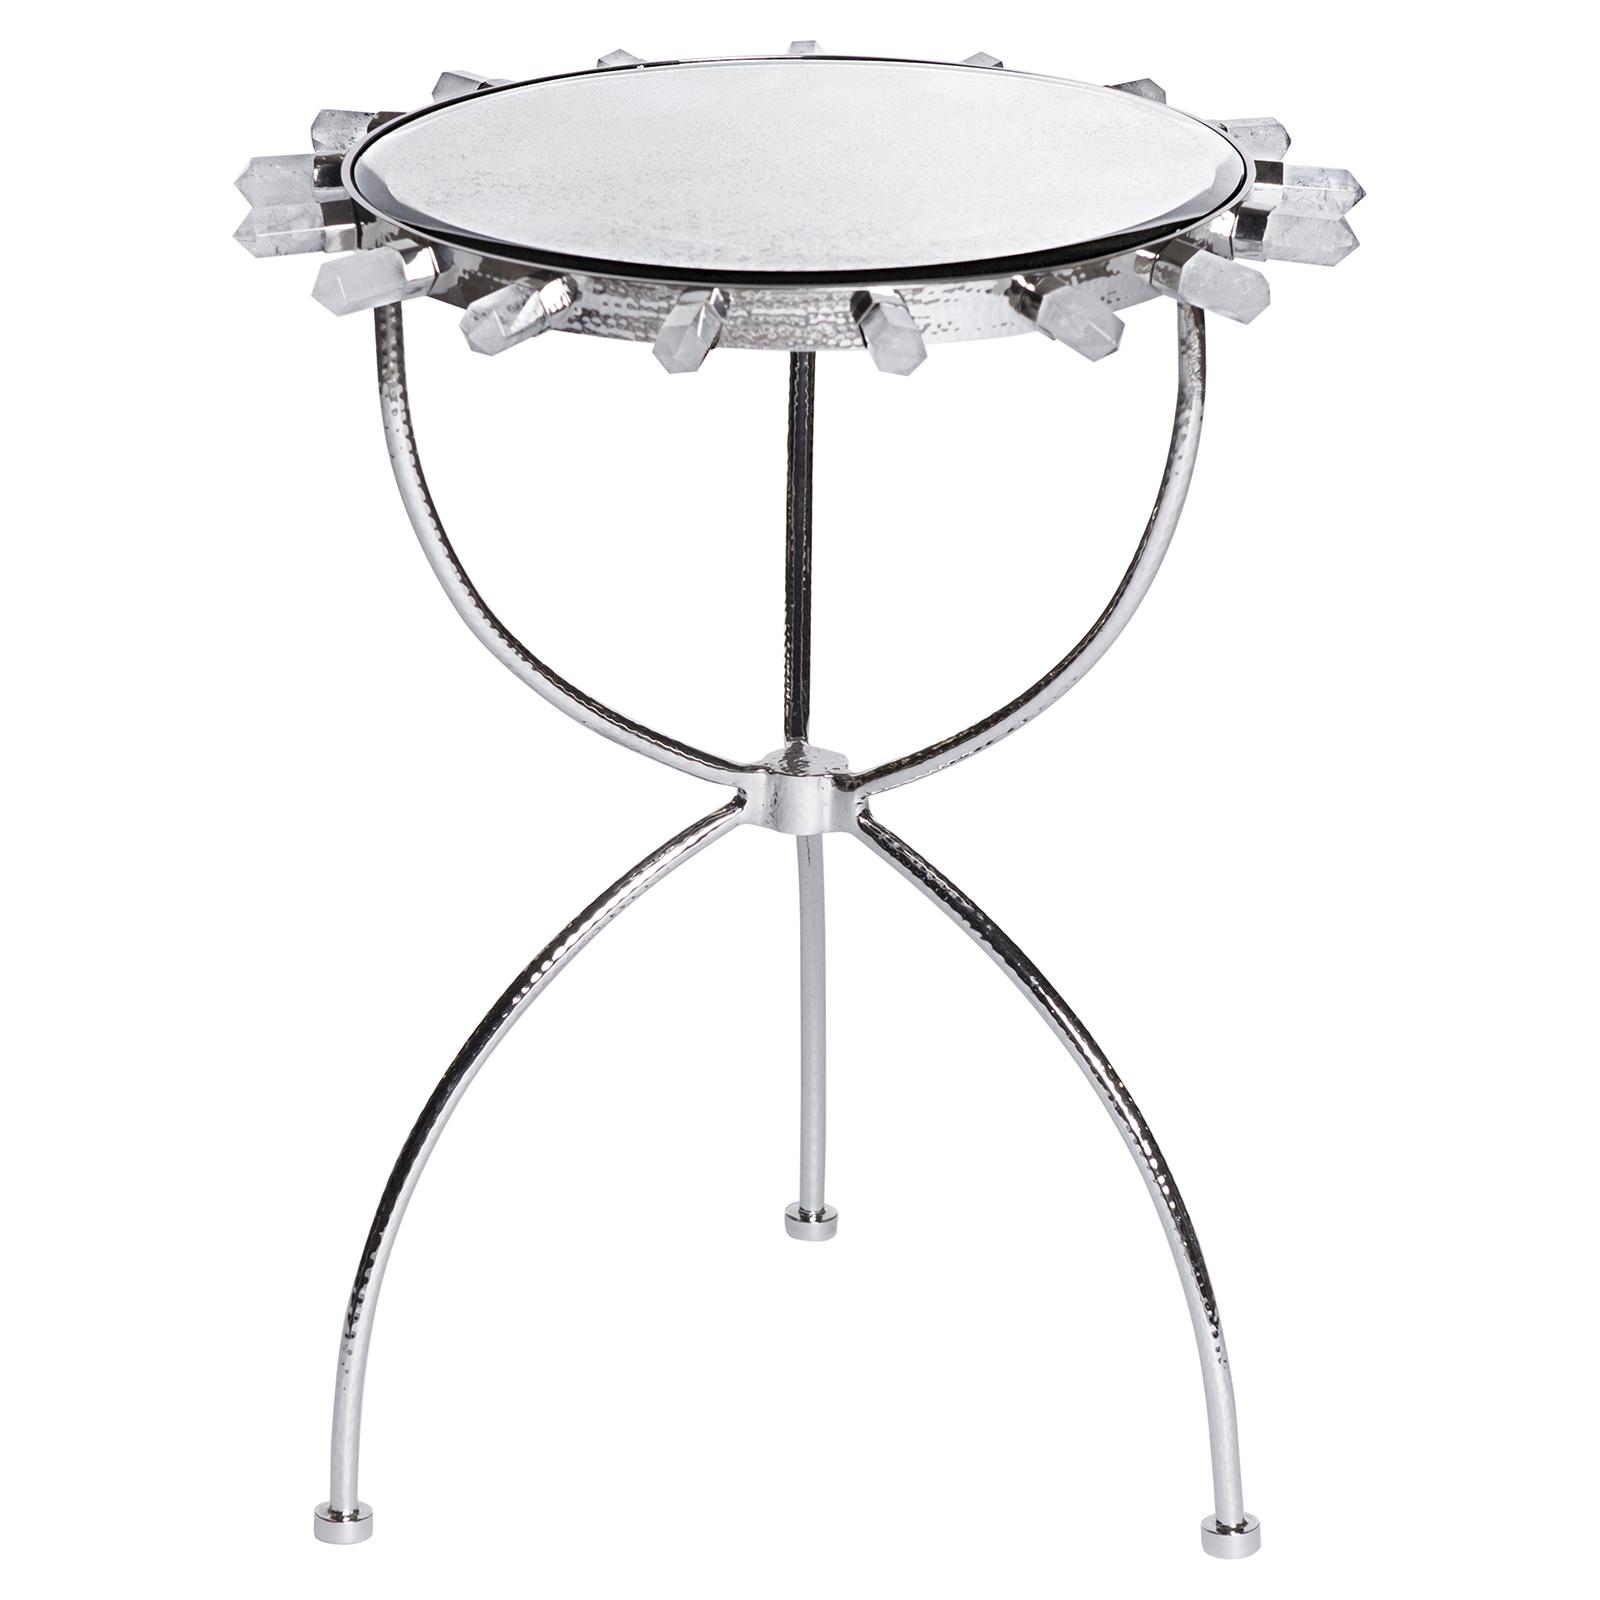 Gretchen Hollywood Regency Quartz Antique Mirror Silver Round Side Table